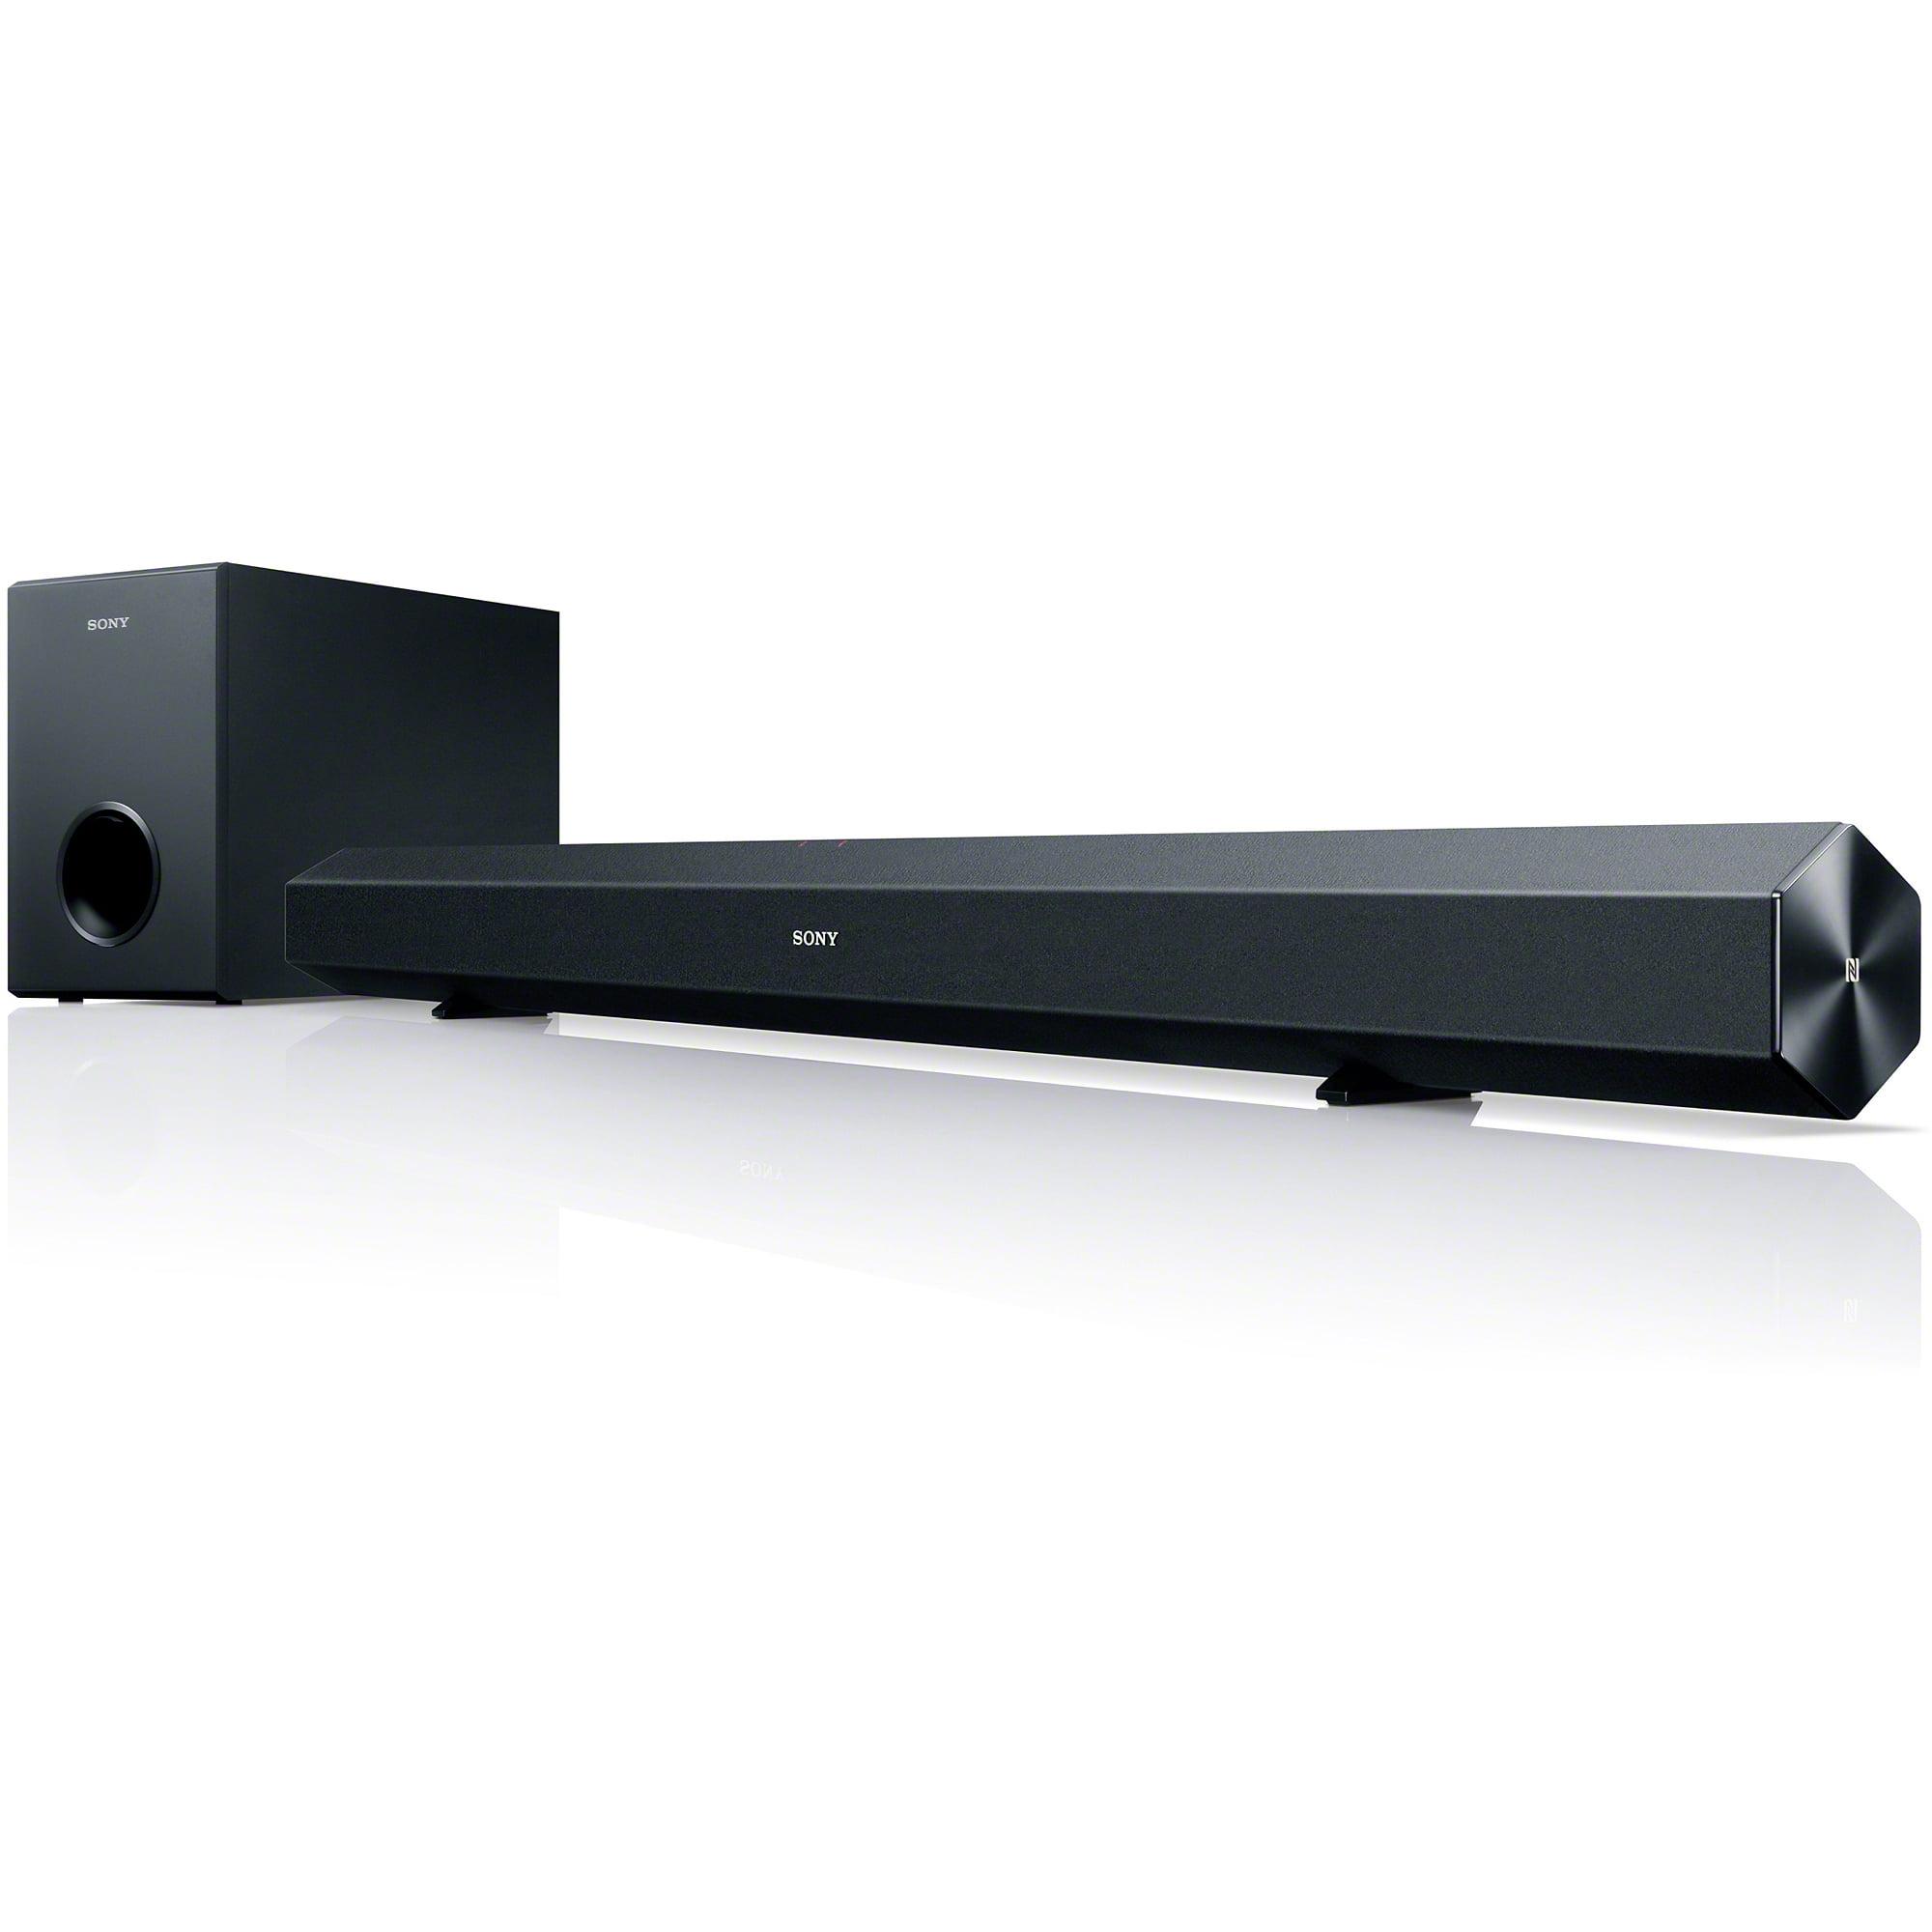 Sony HTCT60BT Sound Bar - Walmart.com